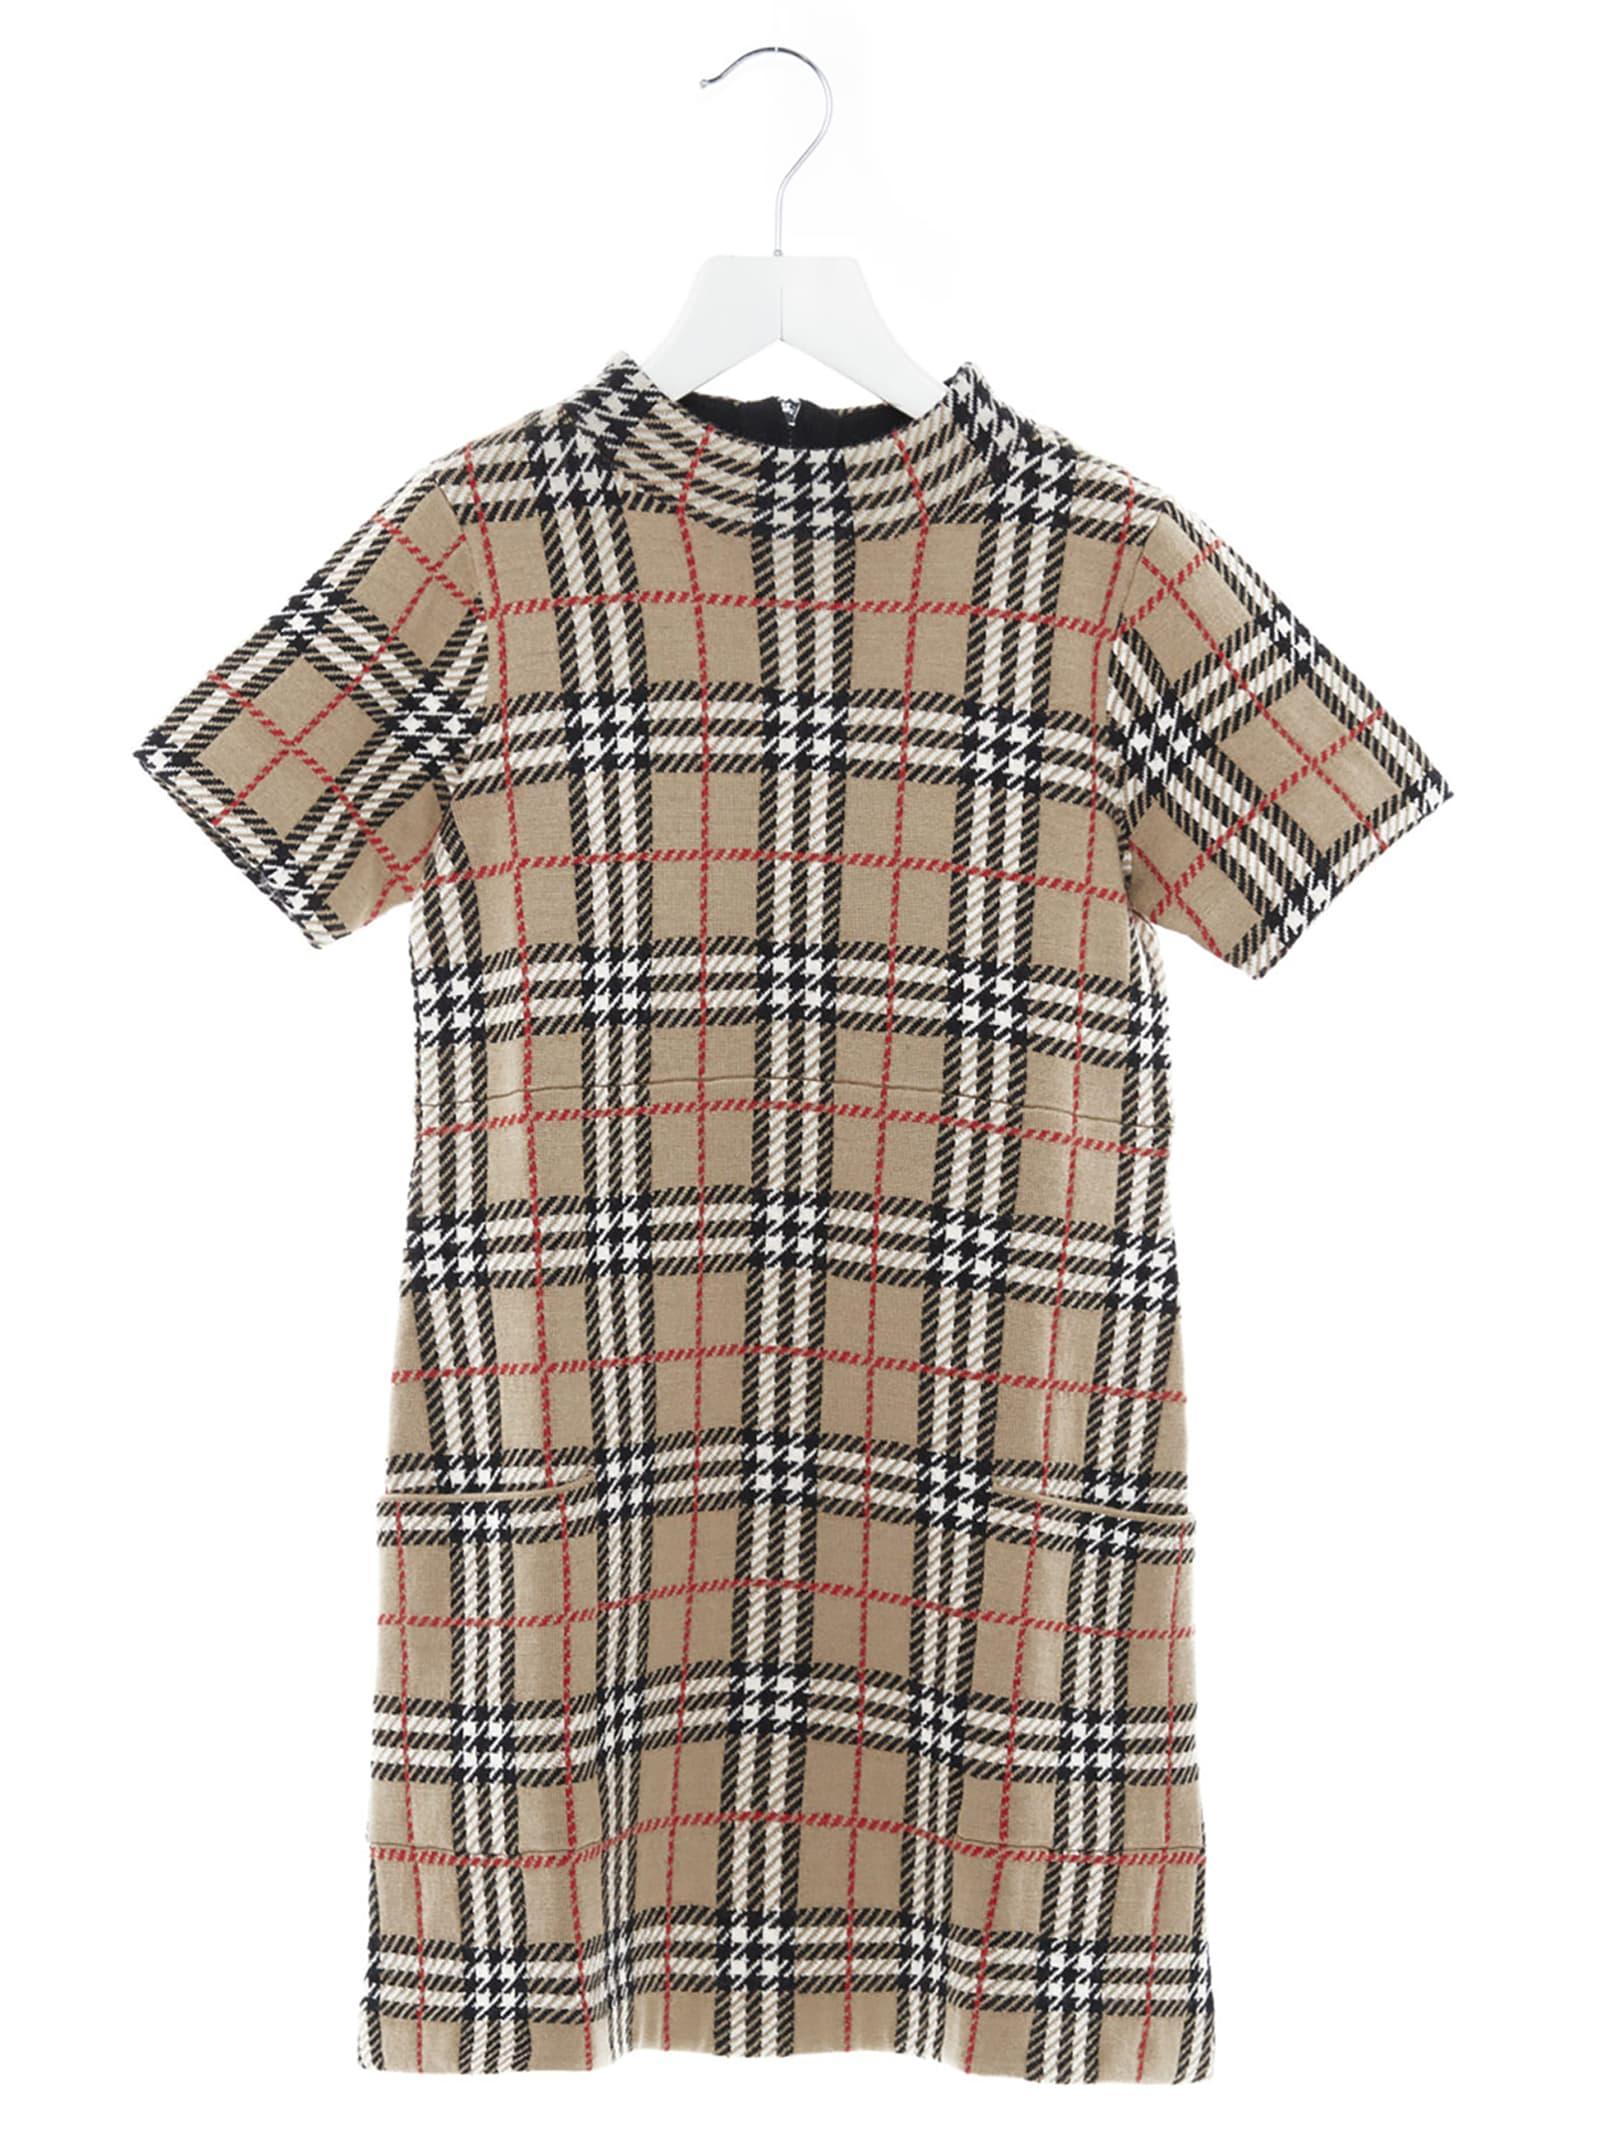 Burberry denise Dress